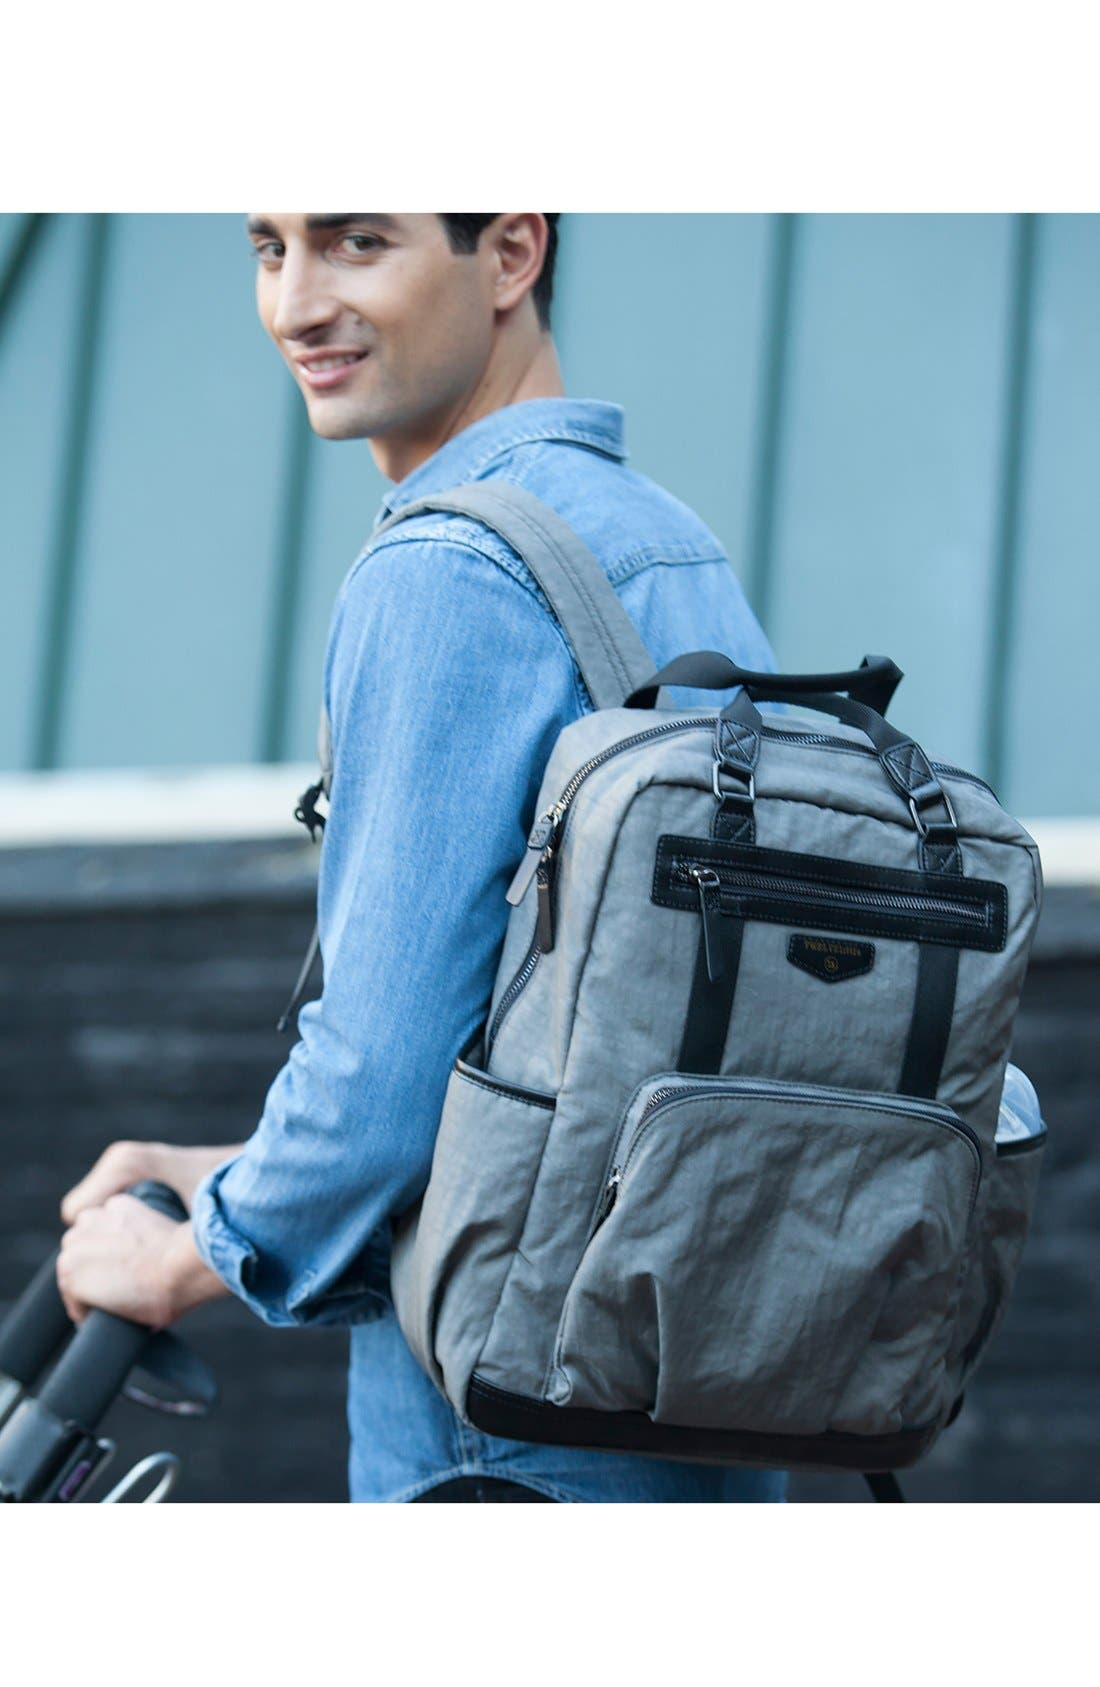 'Courage' Unisex Backpack Diaper Bag,                             Alternate thumbnail 6, color,                             DARK GREY